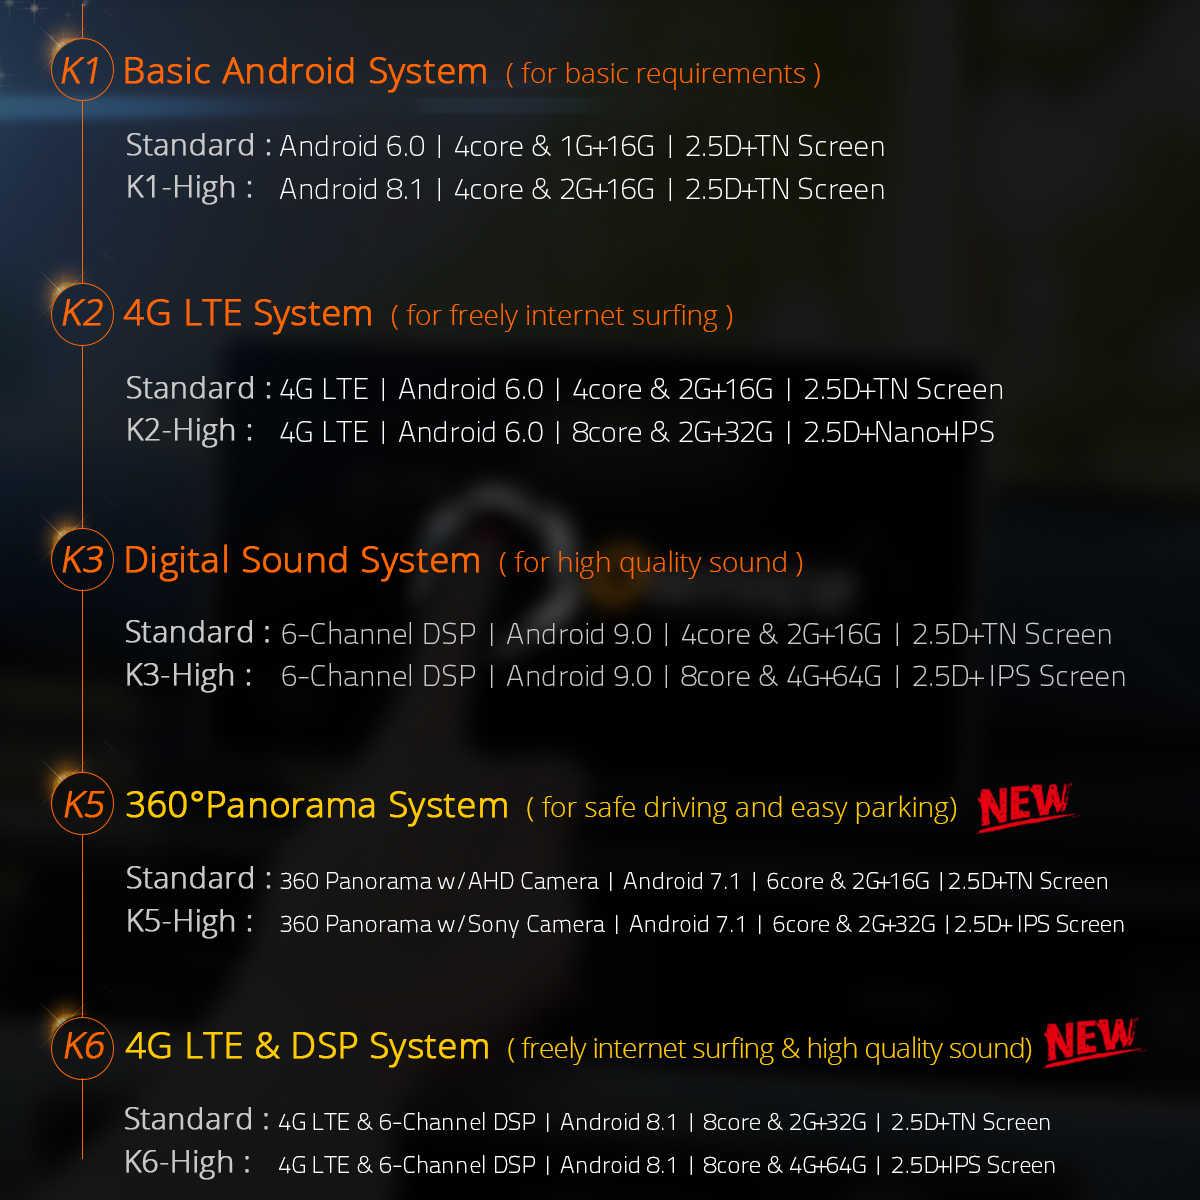 Ownice k3 k5 k6 アンドロイド 9.0 カーラジオ dvd プレーヤー gps ナビゲーションシボレーキャプティバ 2011 - 2017 自動 2din 4 4g lte 光学 dsp